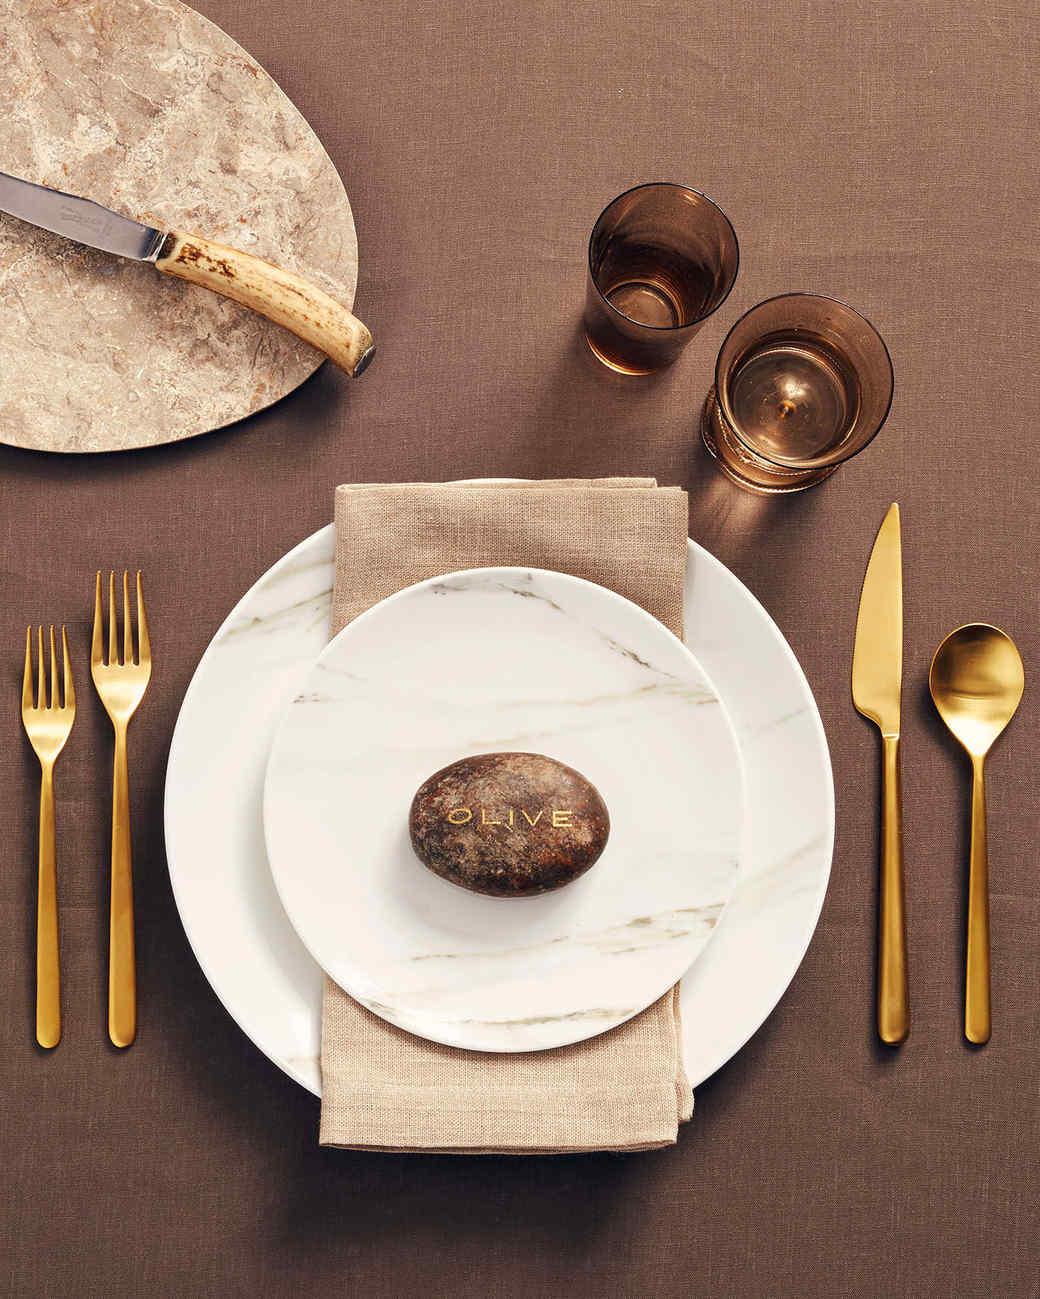 orange accents mushroom plate on place setting